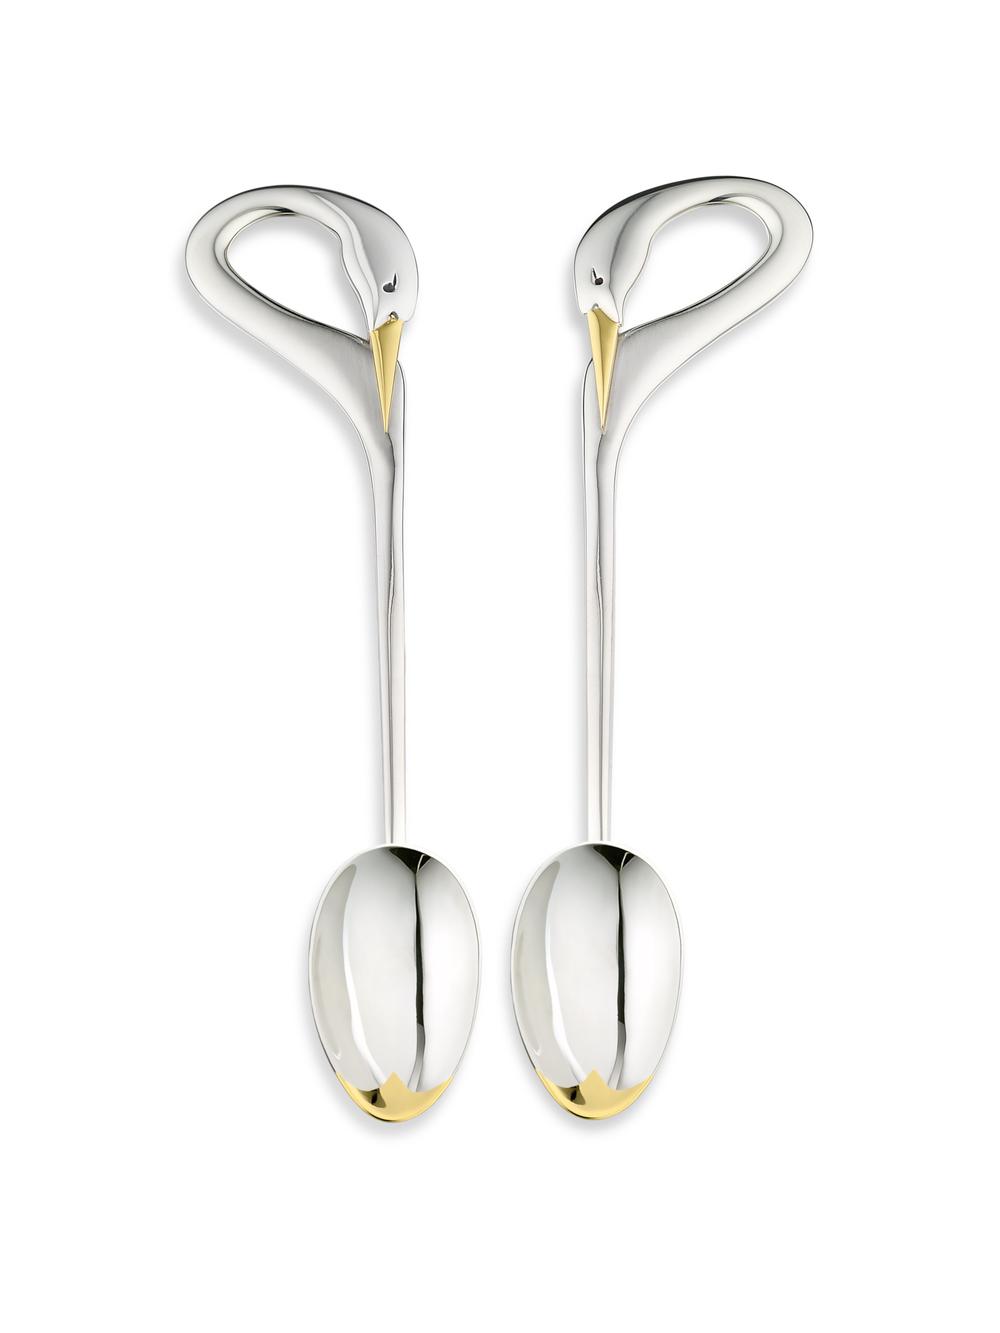 HL Crane Spoons.jpg